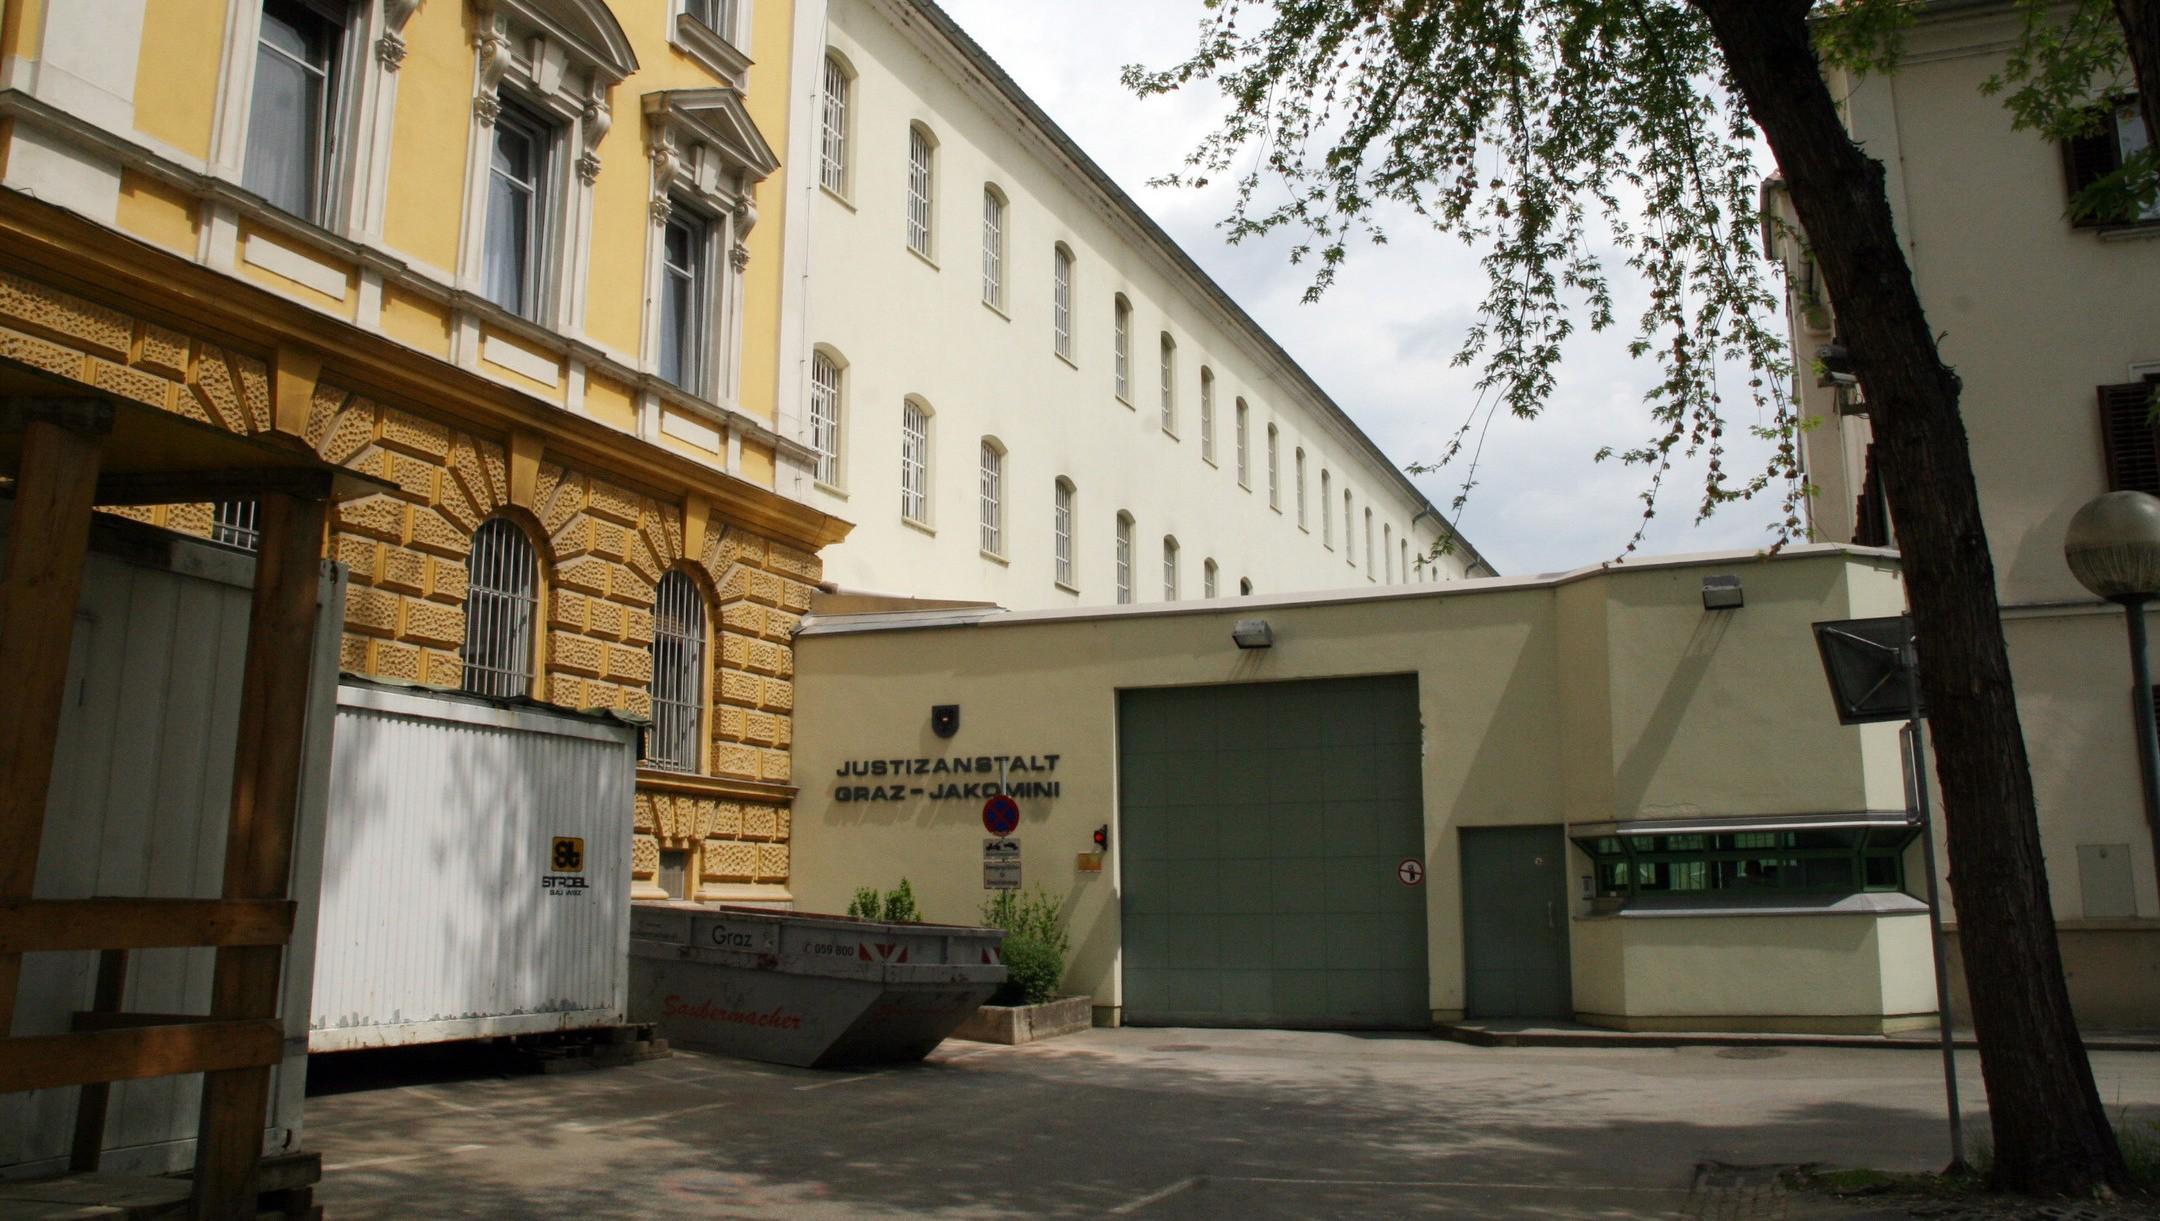 Sexkontakte Graz Jakomini Linz Kleinmnchen - Frau Sucht